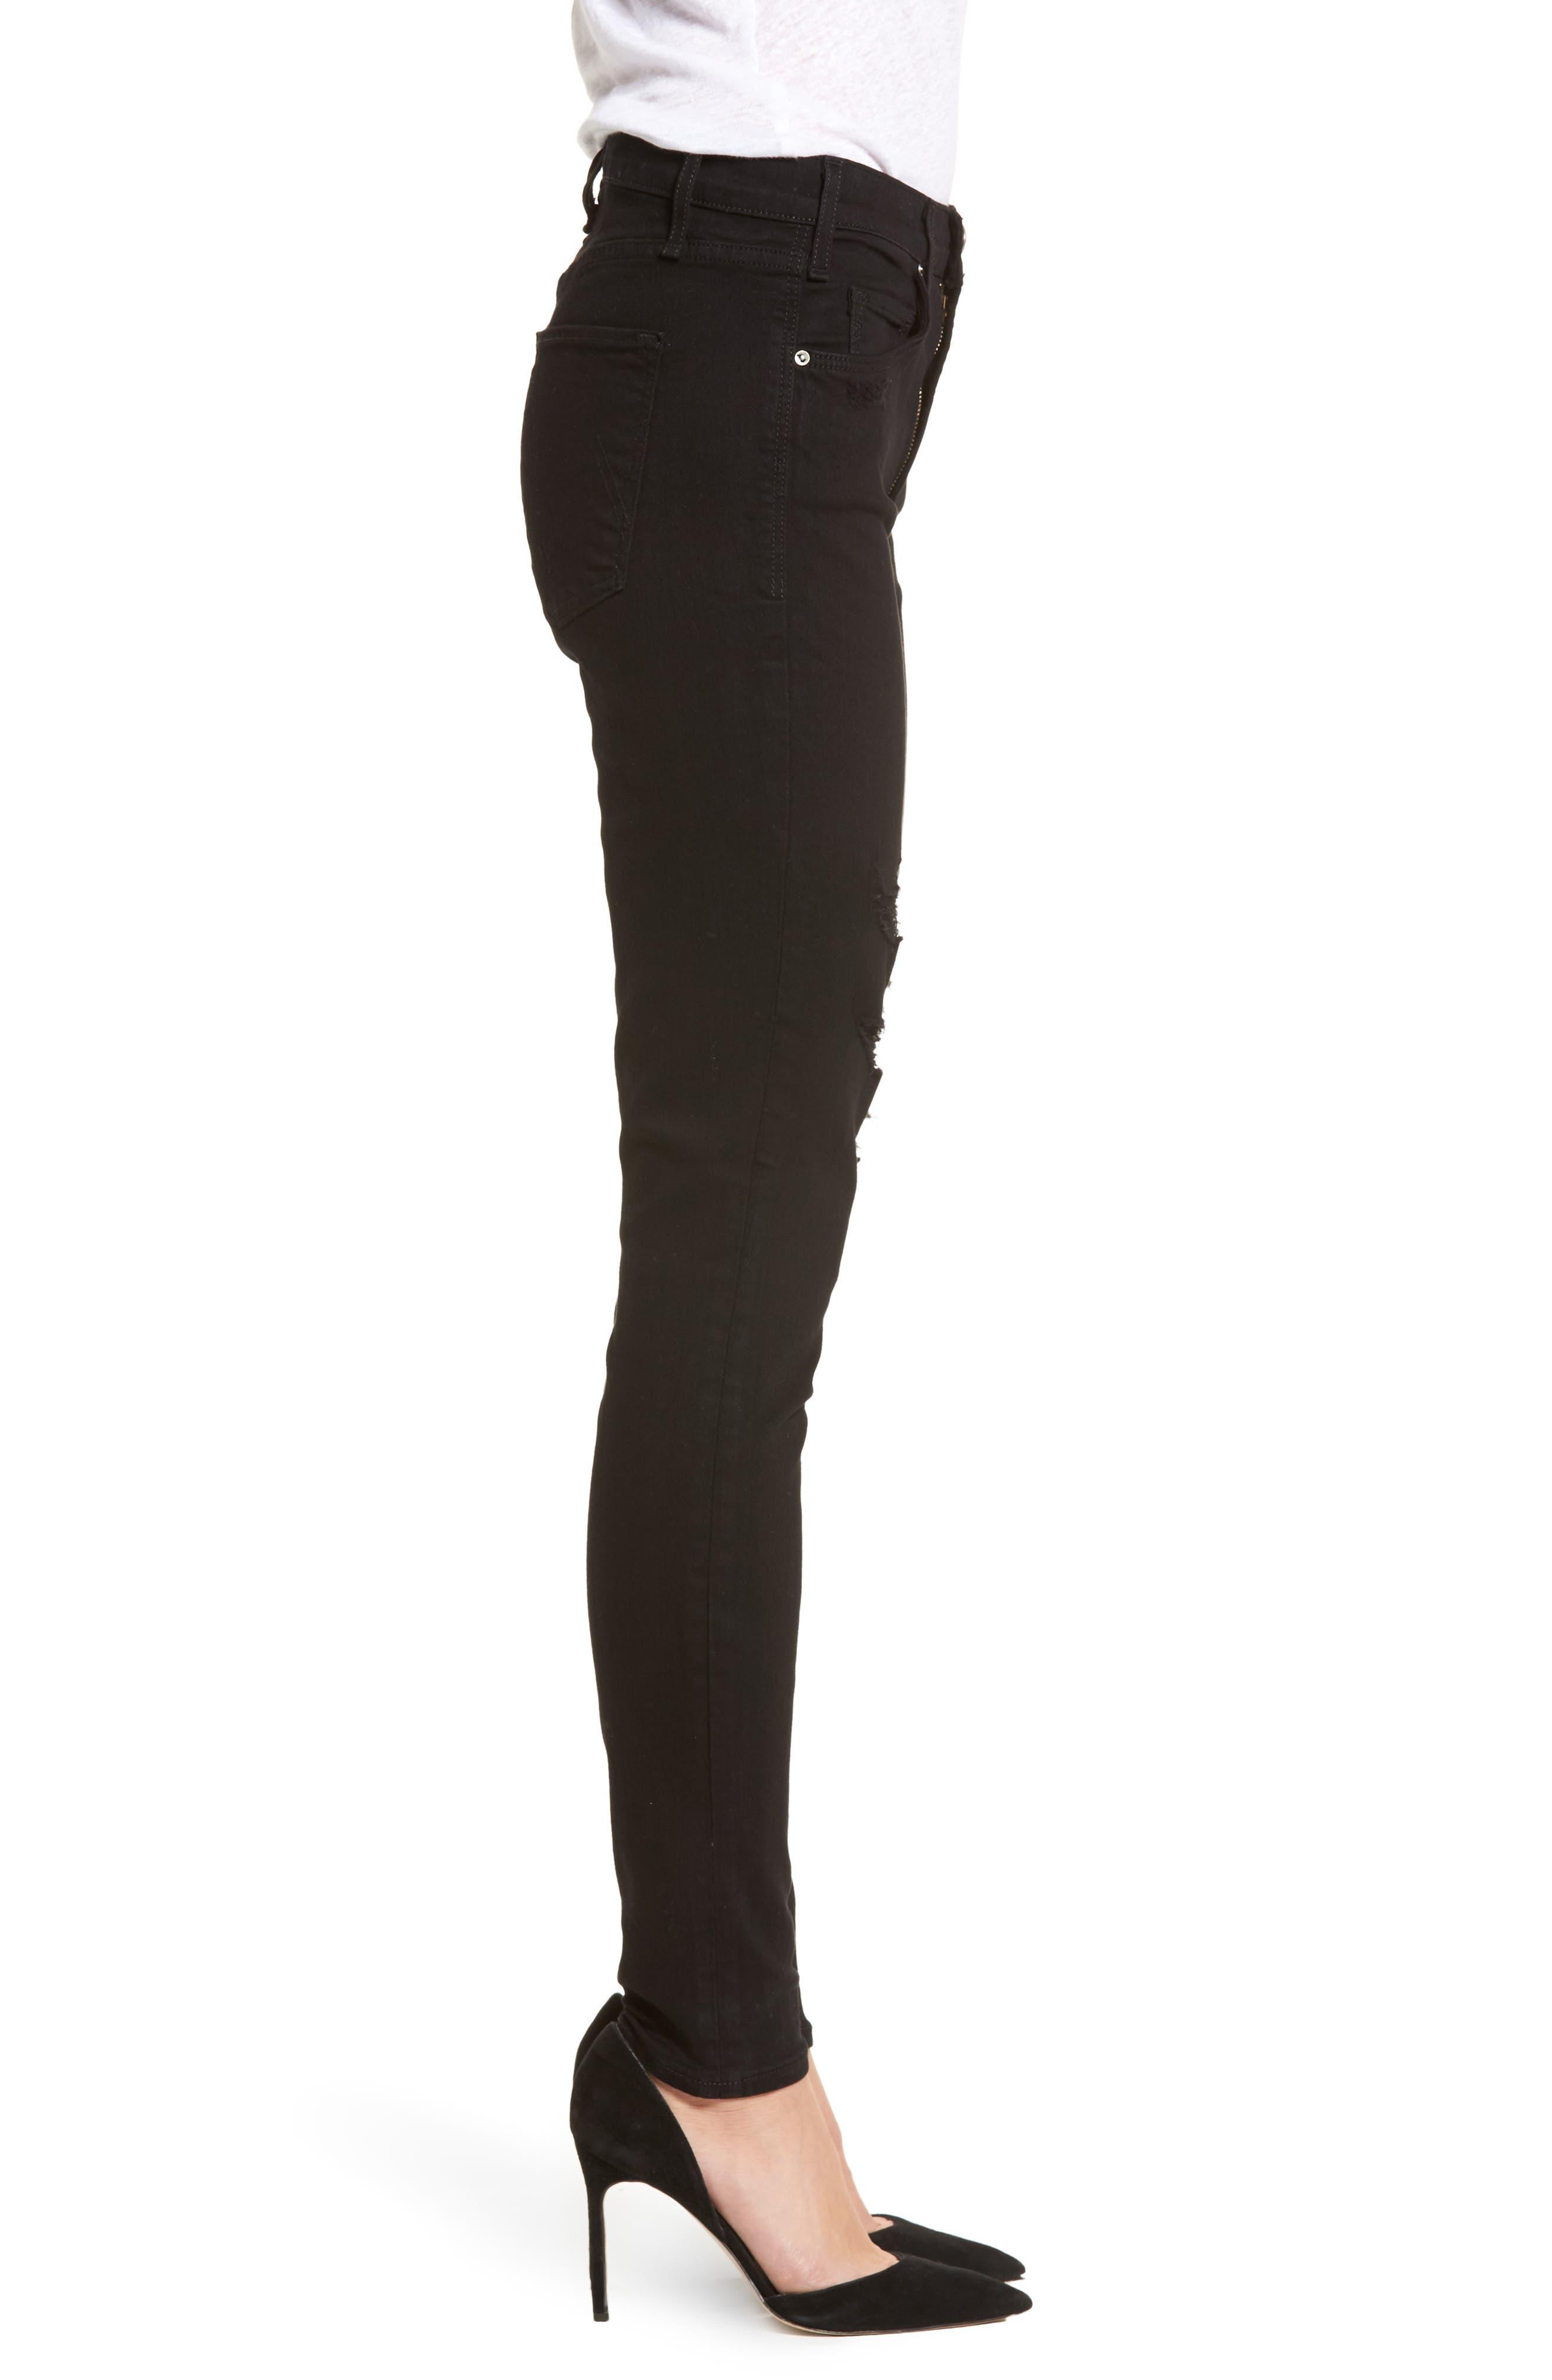 Newton Ankle Skinny Jeans,                             Alternate thumbnail 3, color,                             001